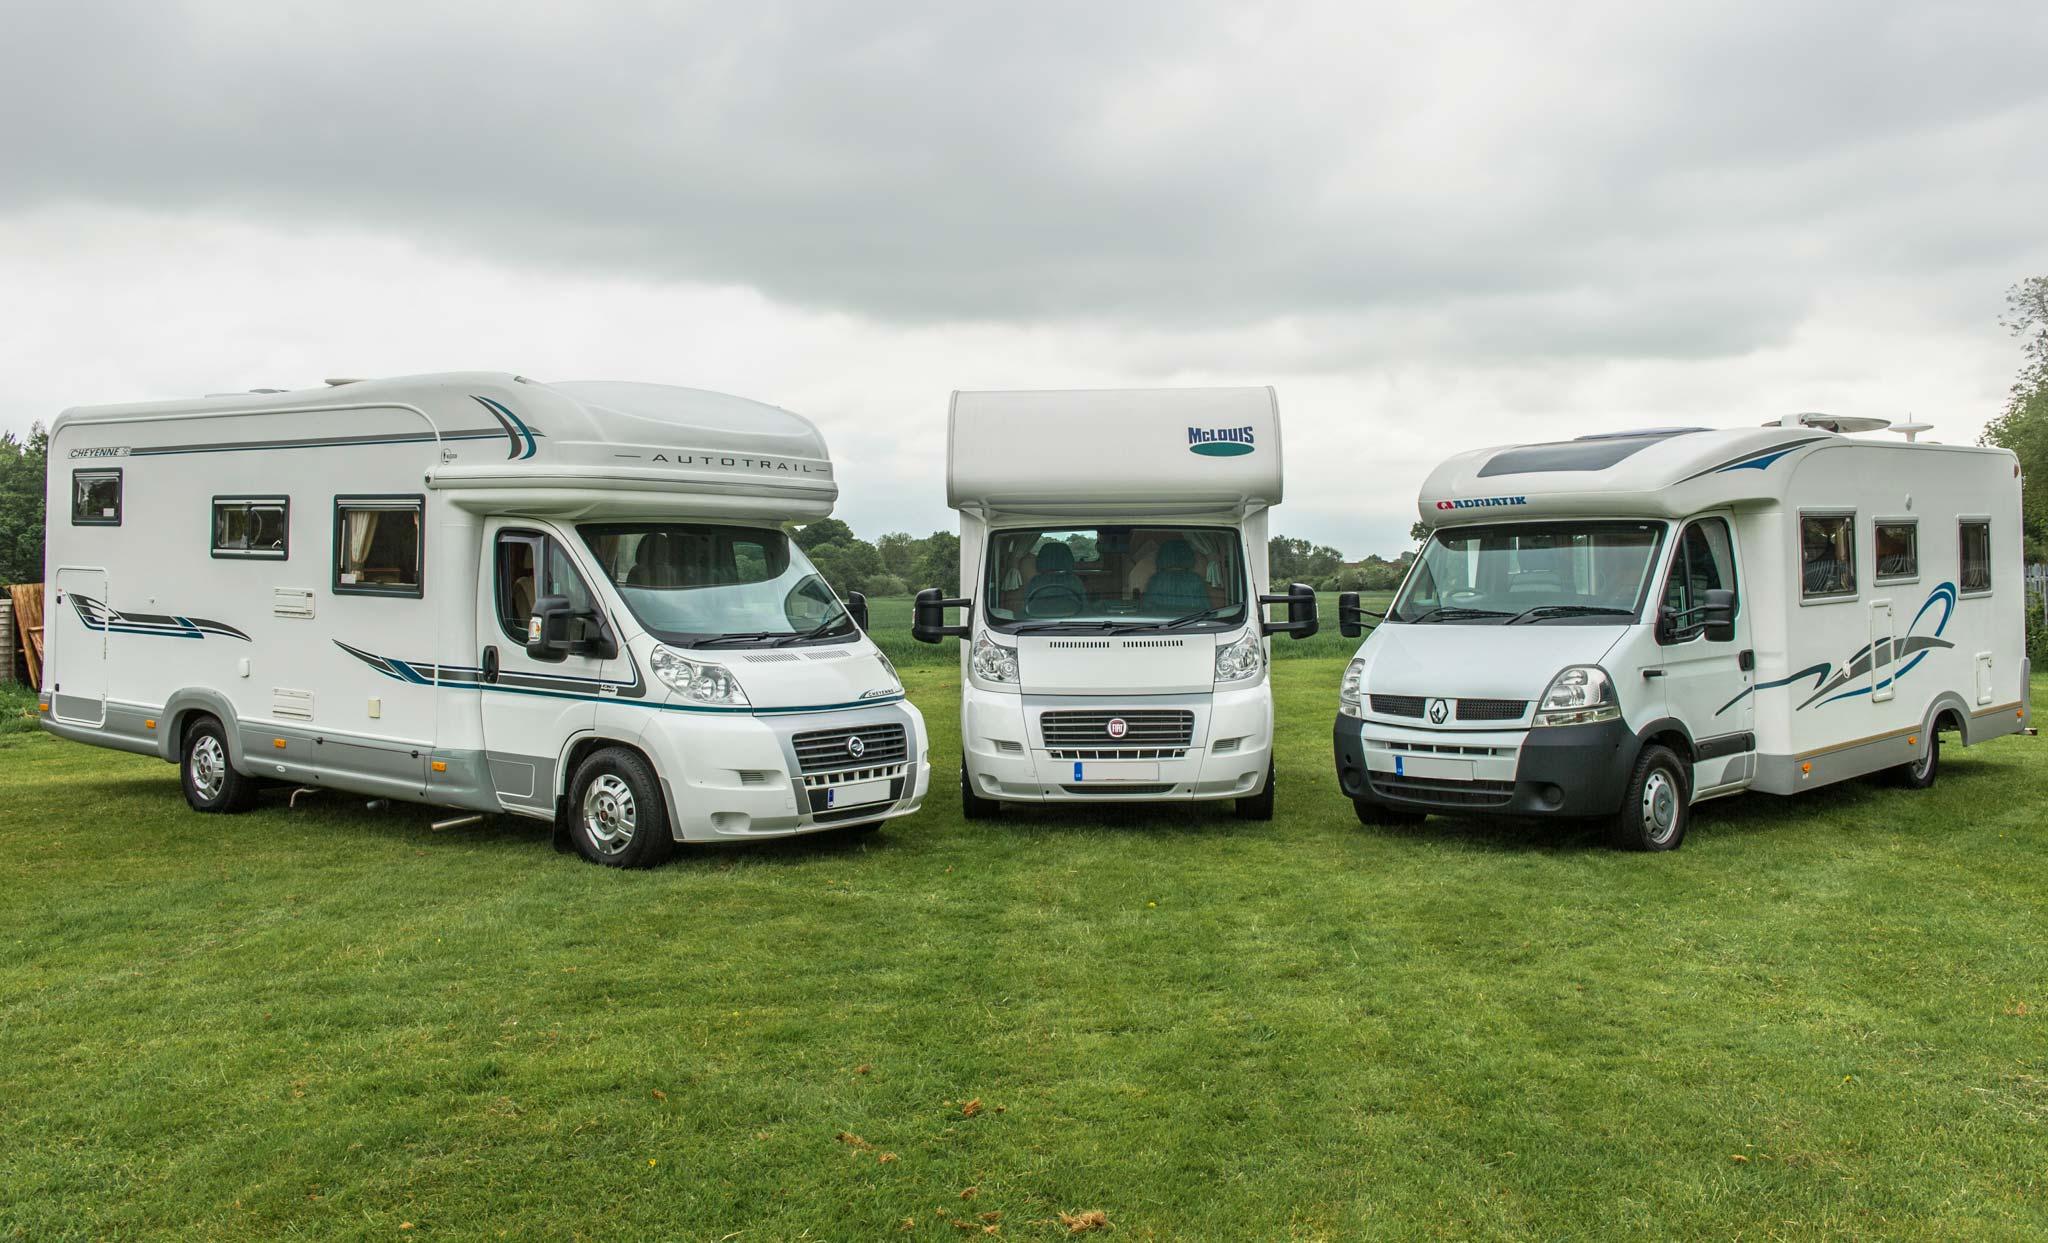 Motorhome Sales in Studley Warwickshire